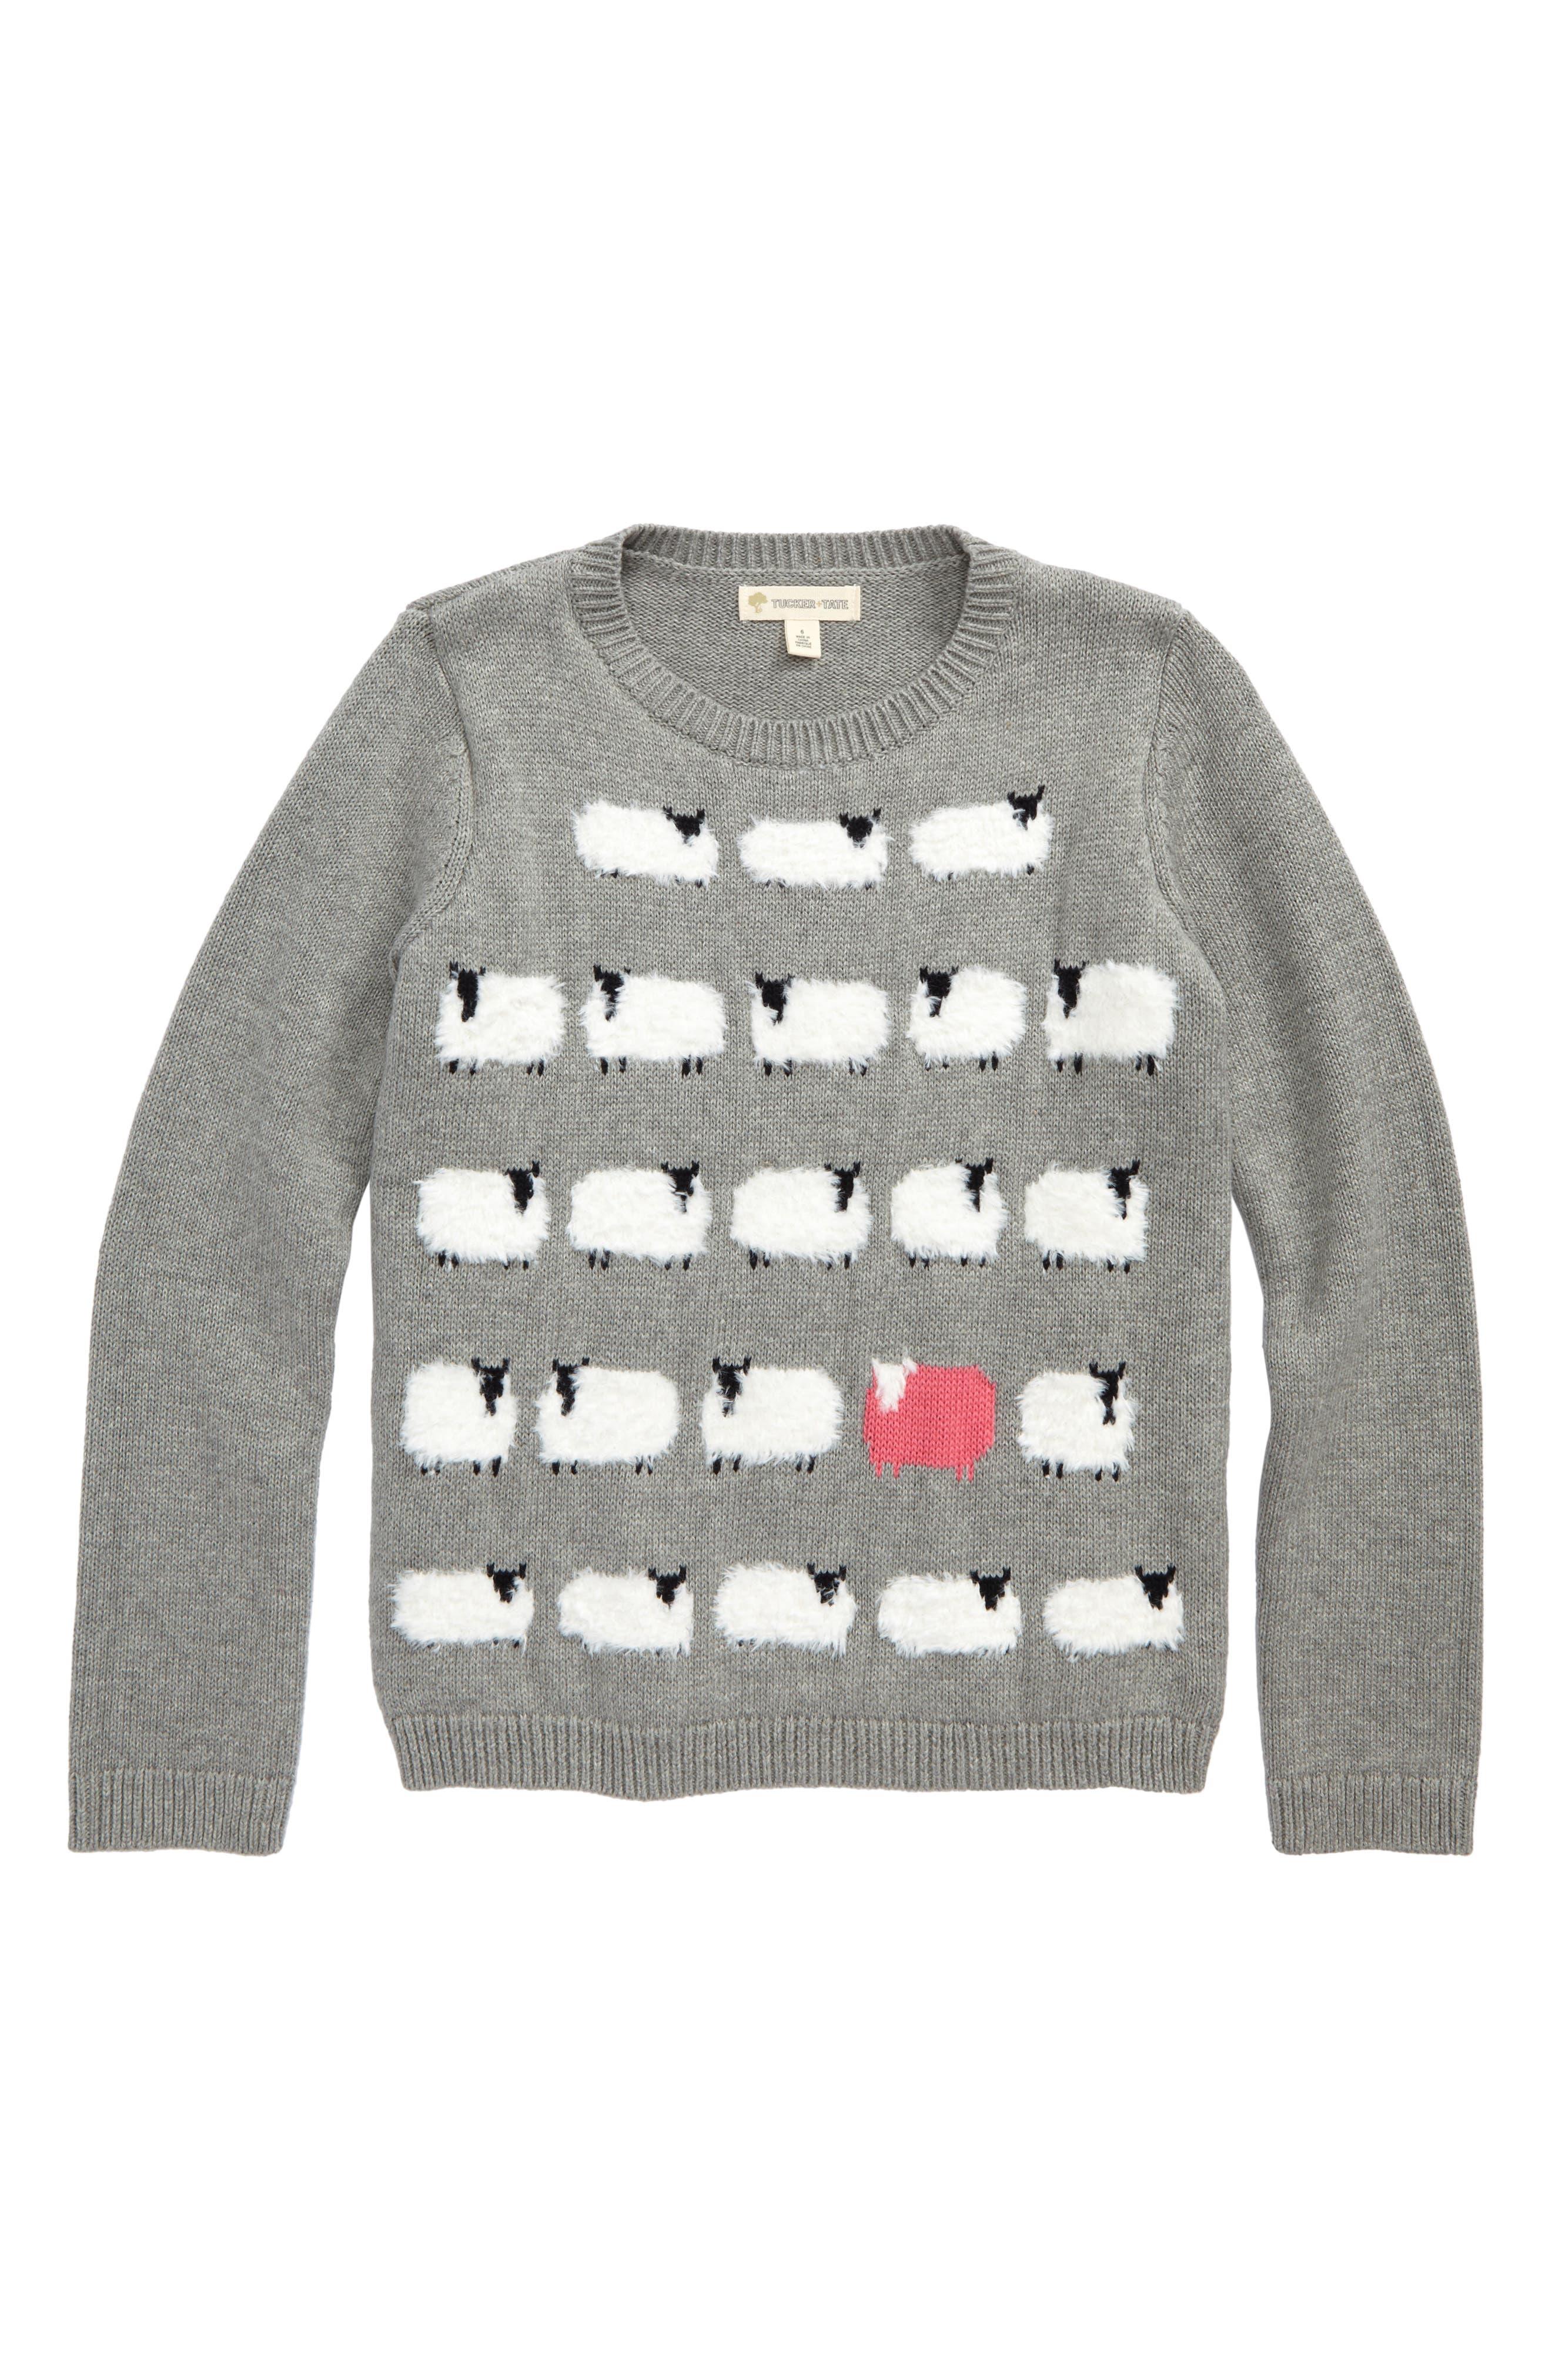 Alternate Image 1 Selected - Tucker + Tate Intarsia Knit Sweater (Toddler Girls, Little Girls & Big Girls)